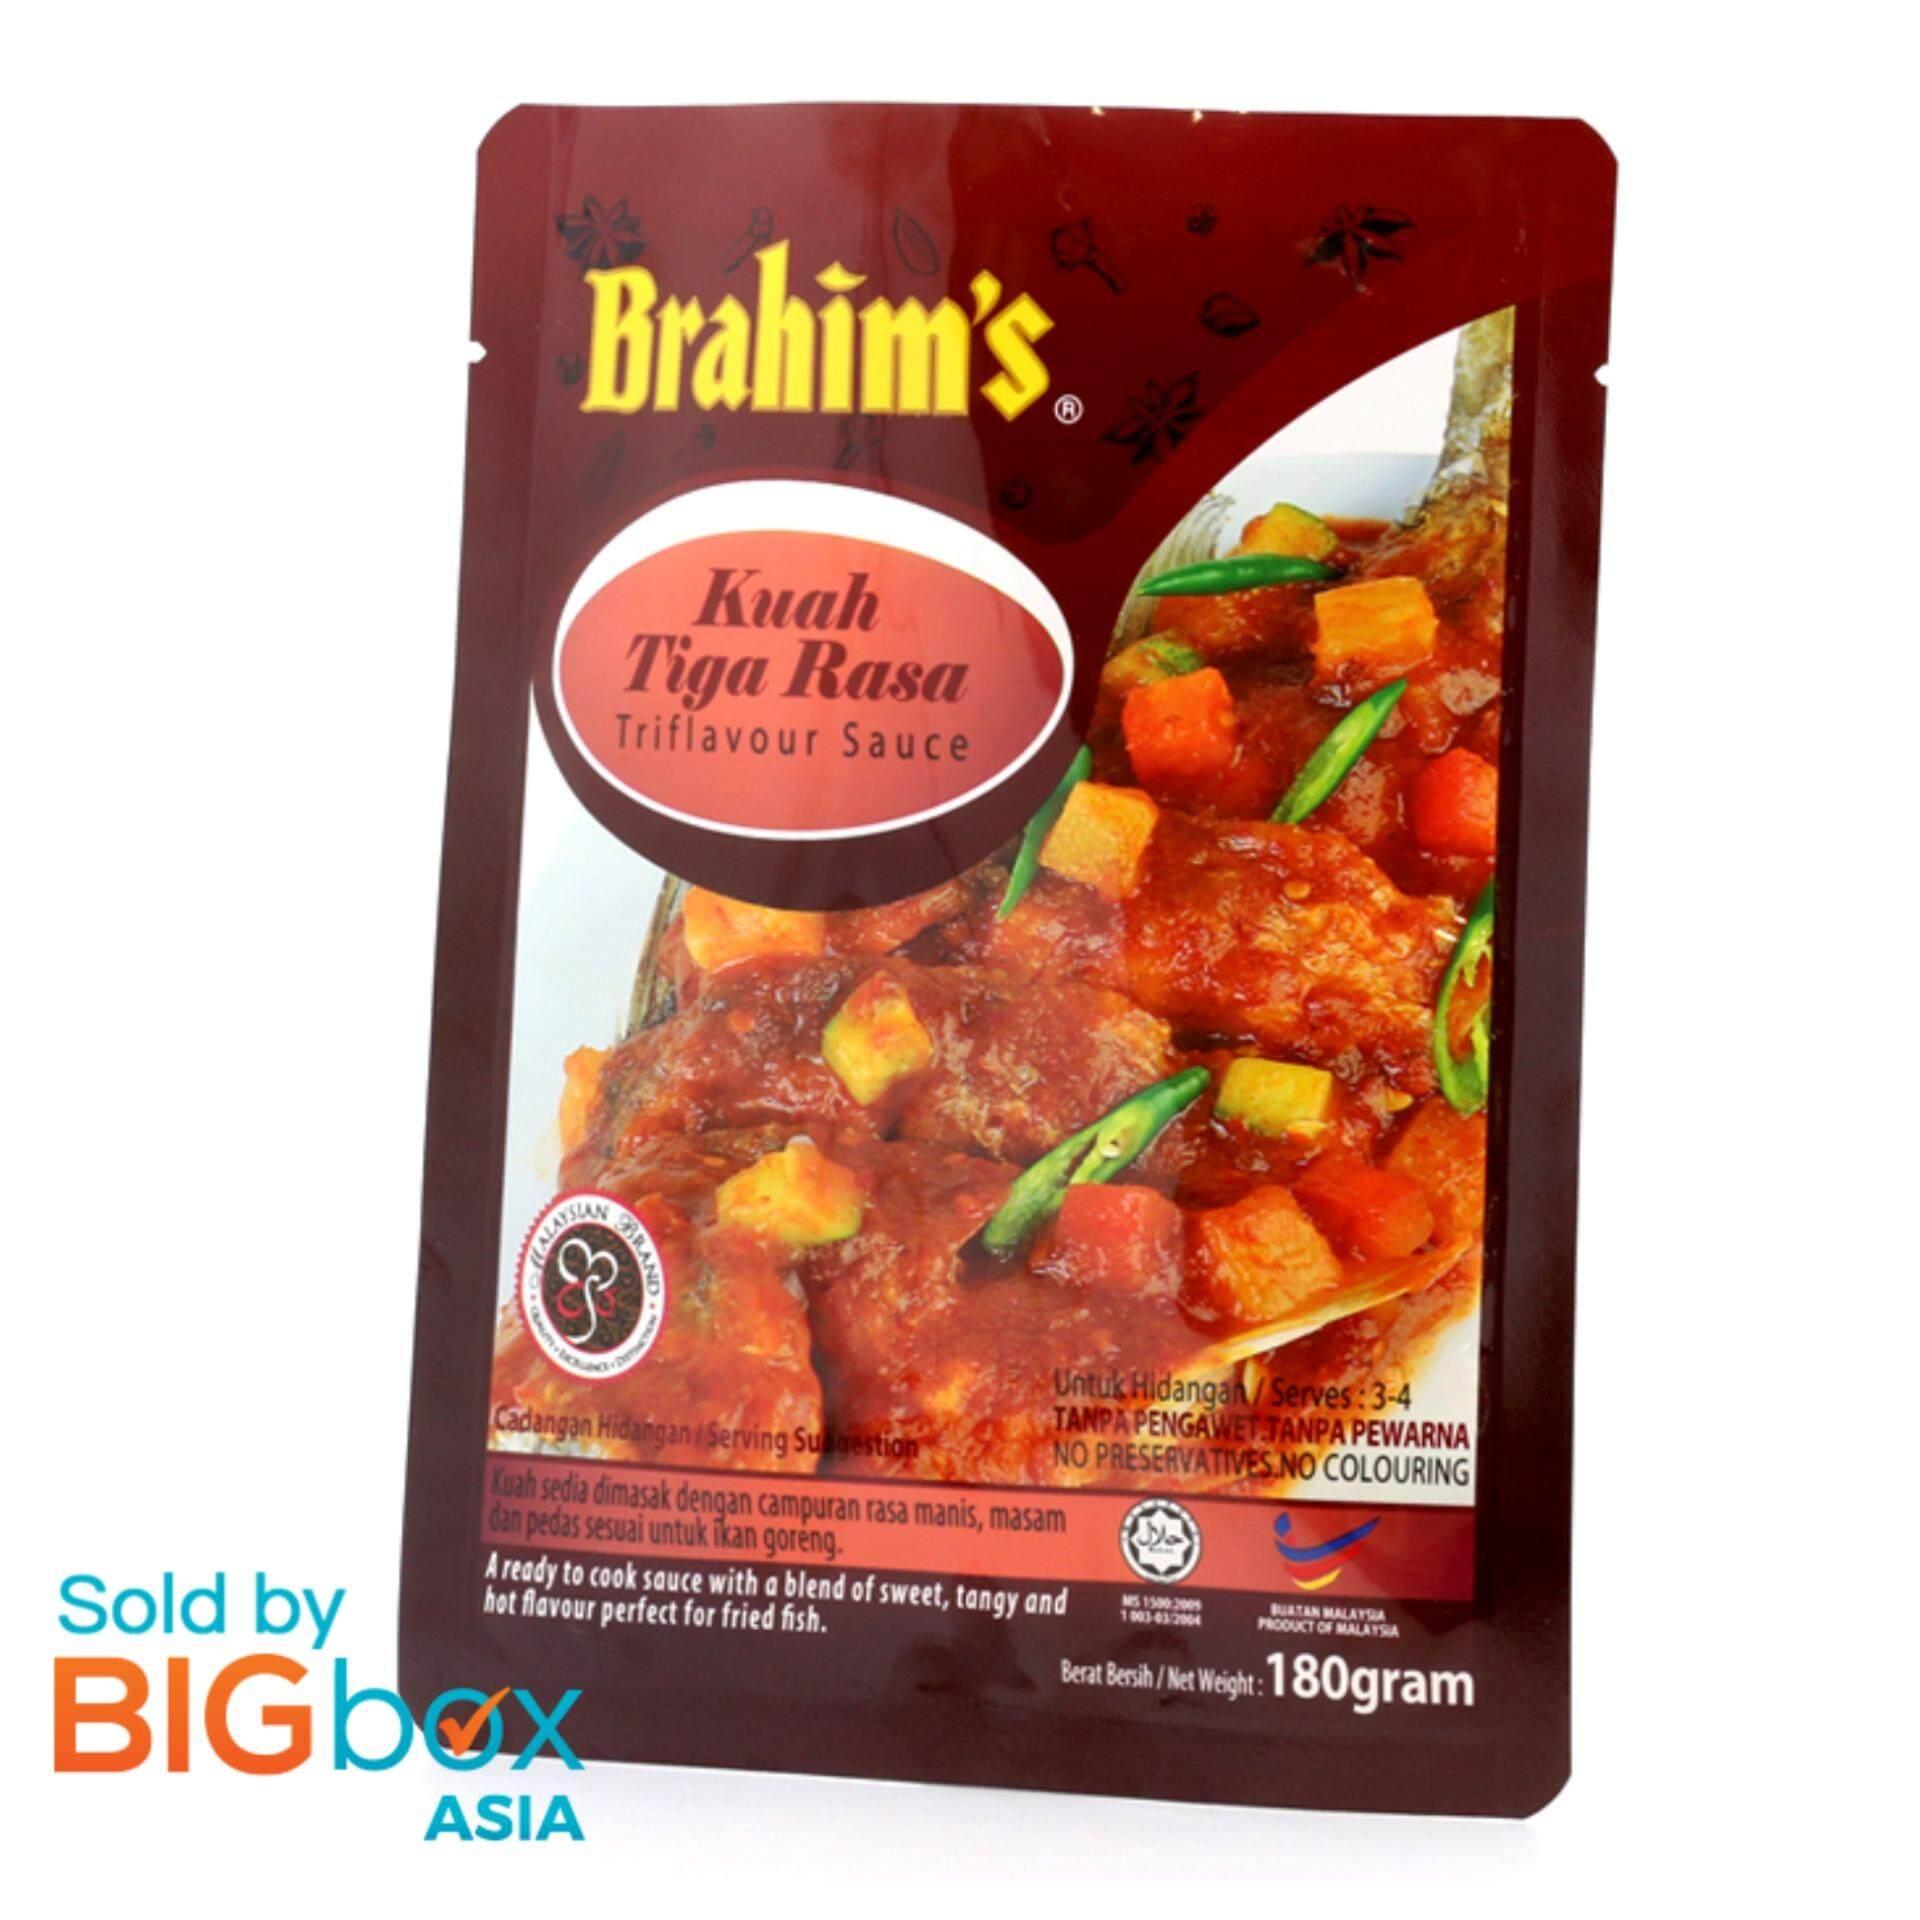 [BIGBox Asia] Brahims Ready To Use Triflavour Sauce 180g - Malaysia